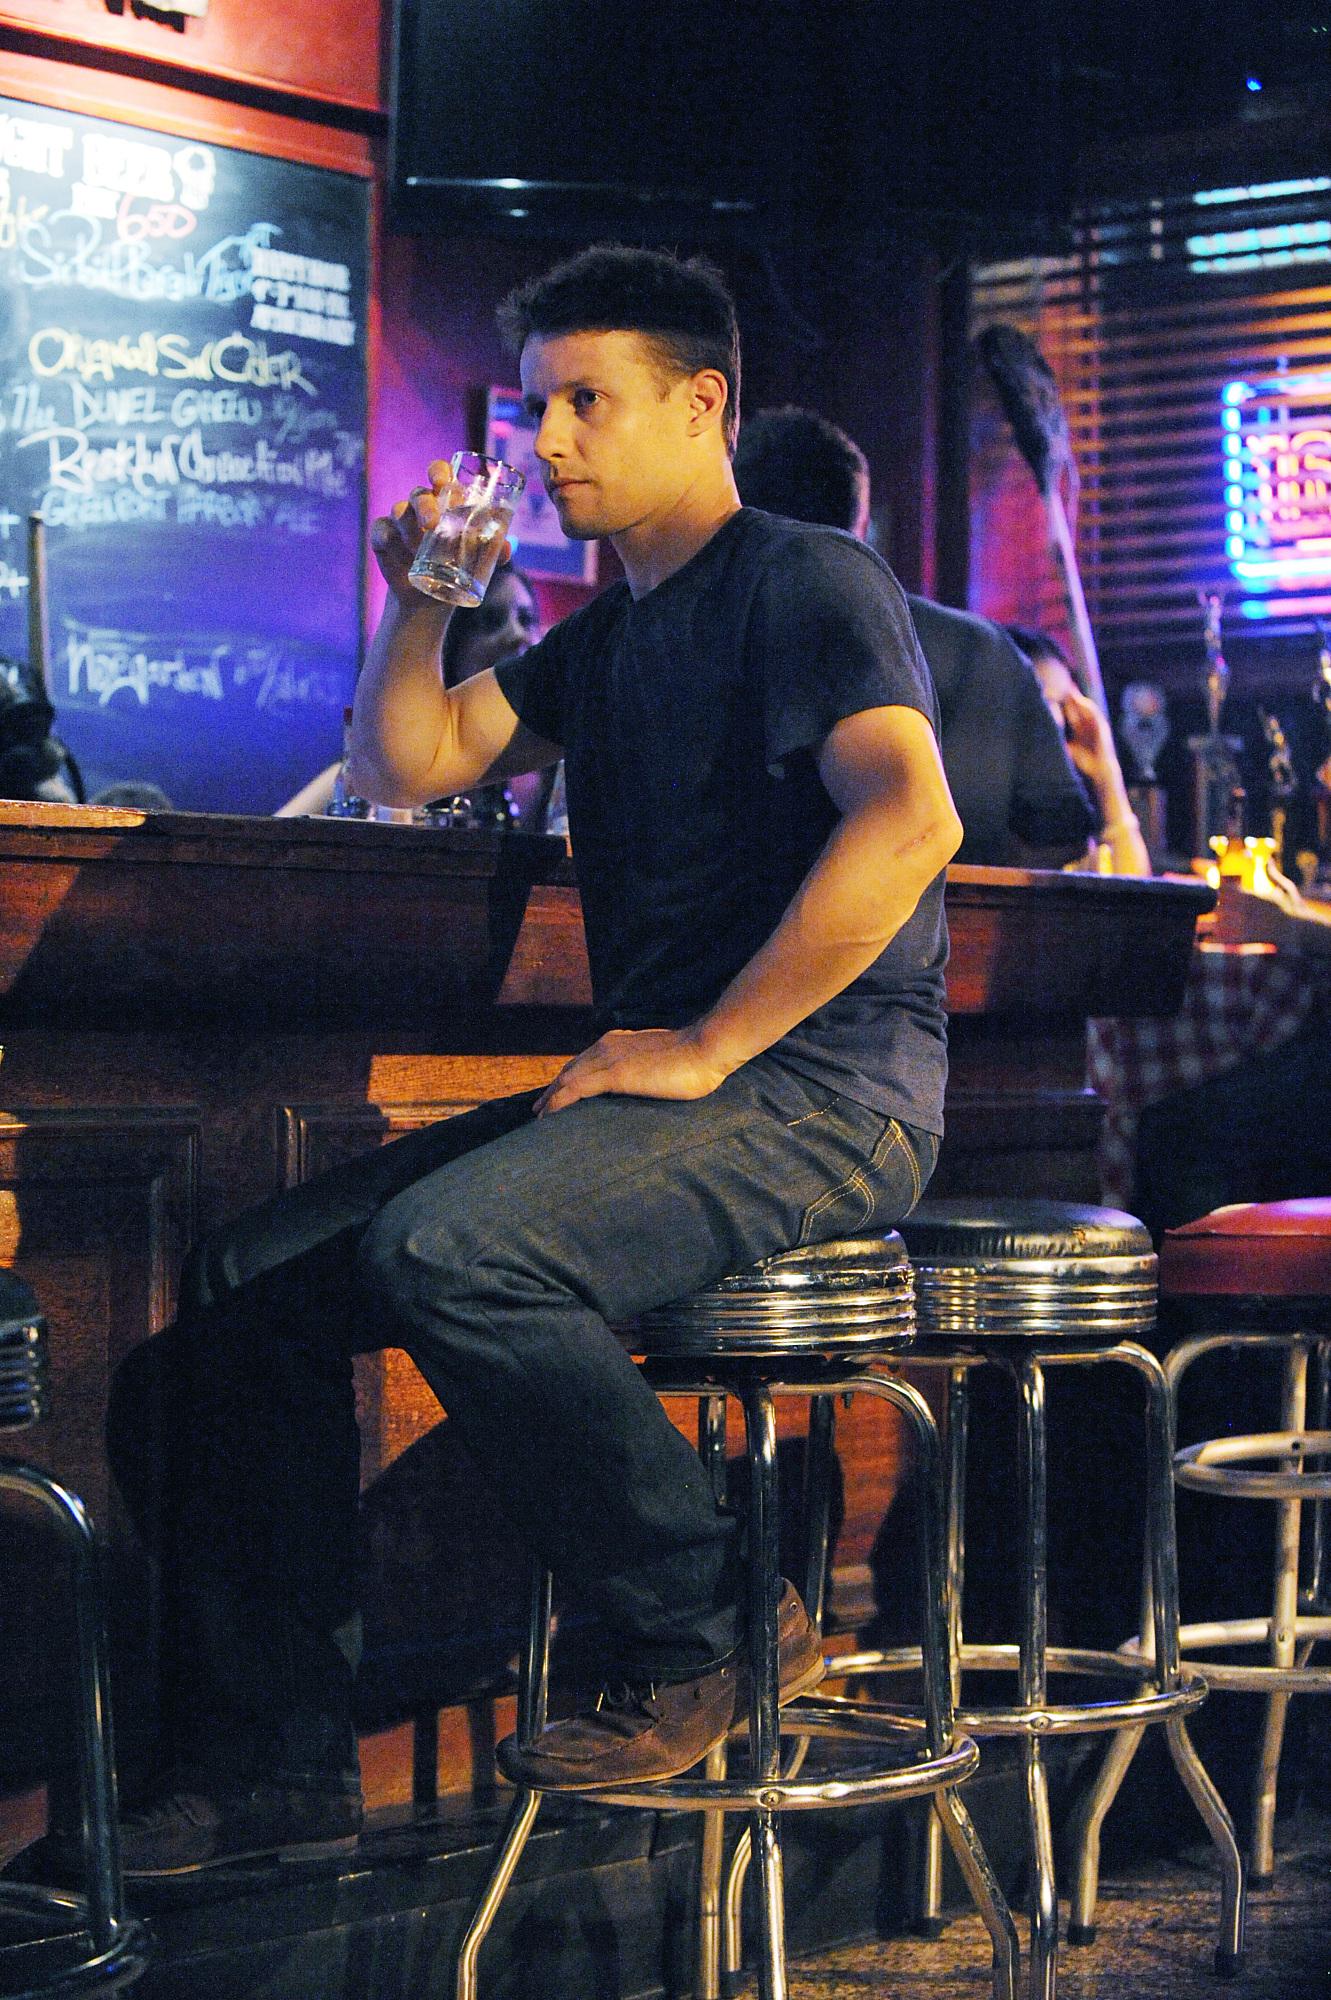 Jamie enjoys a drink